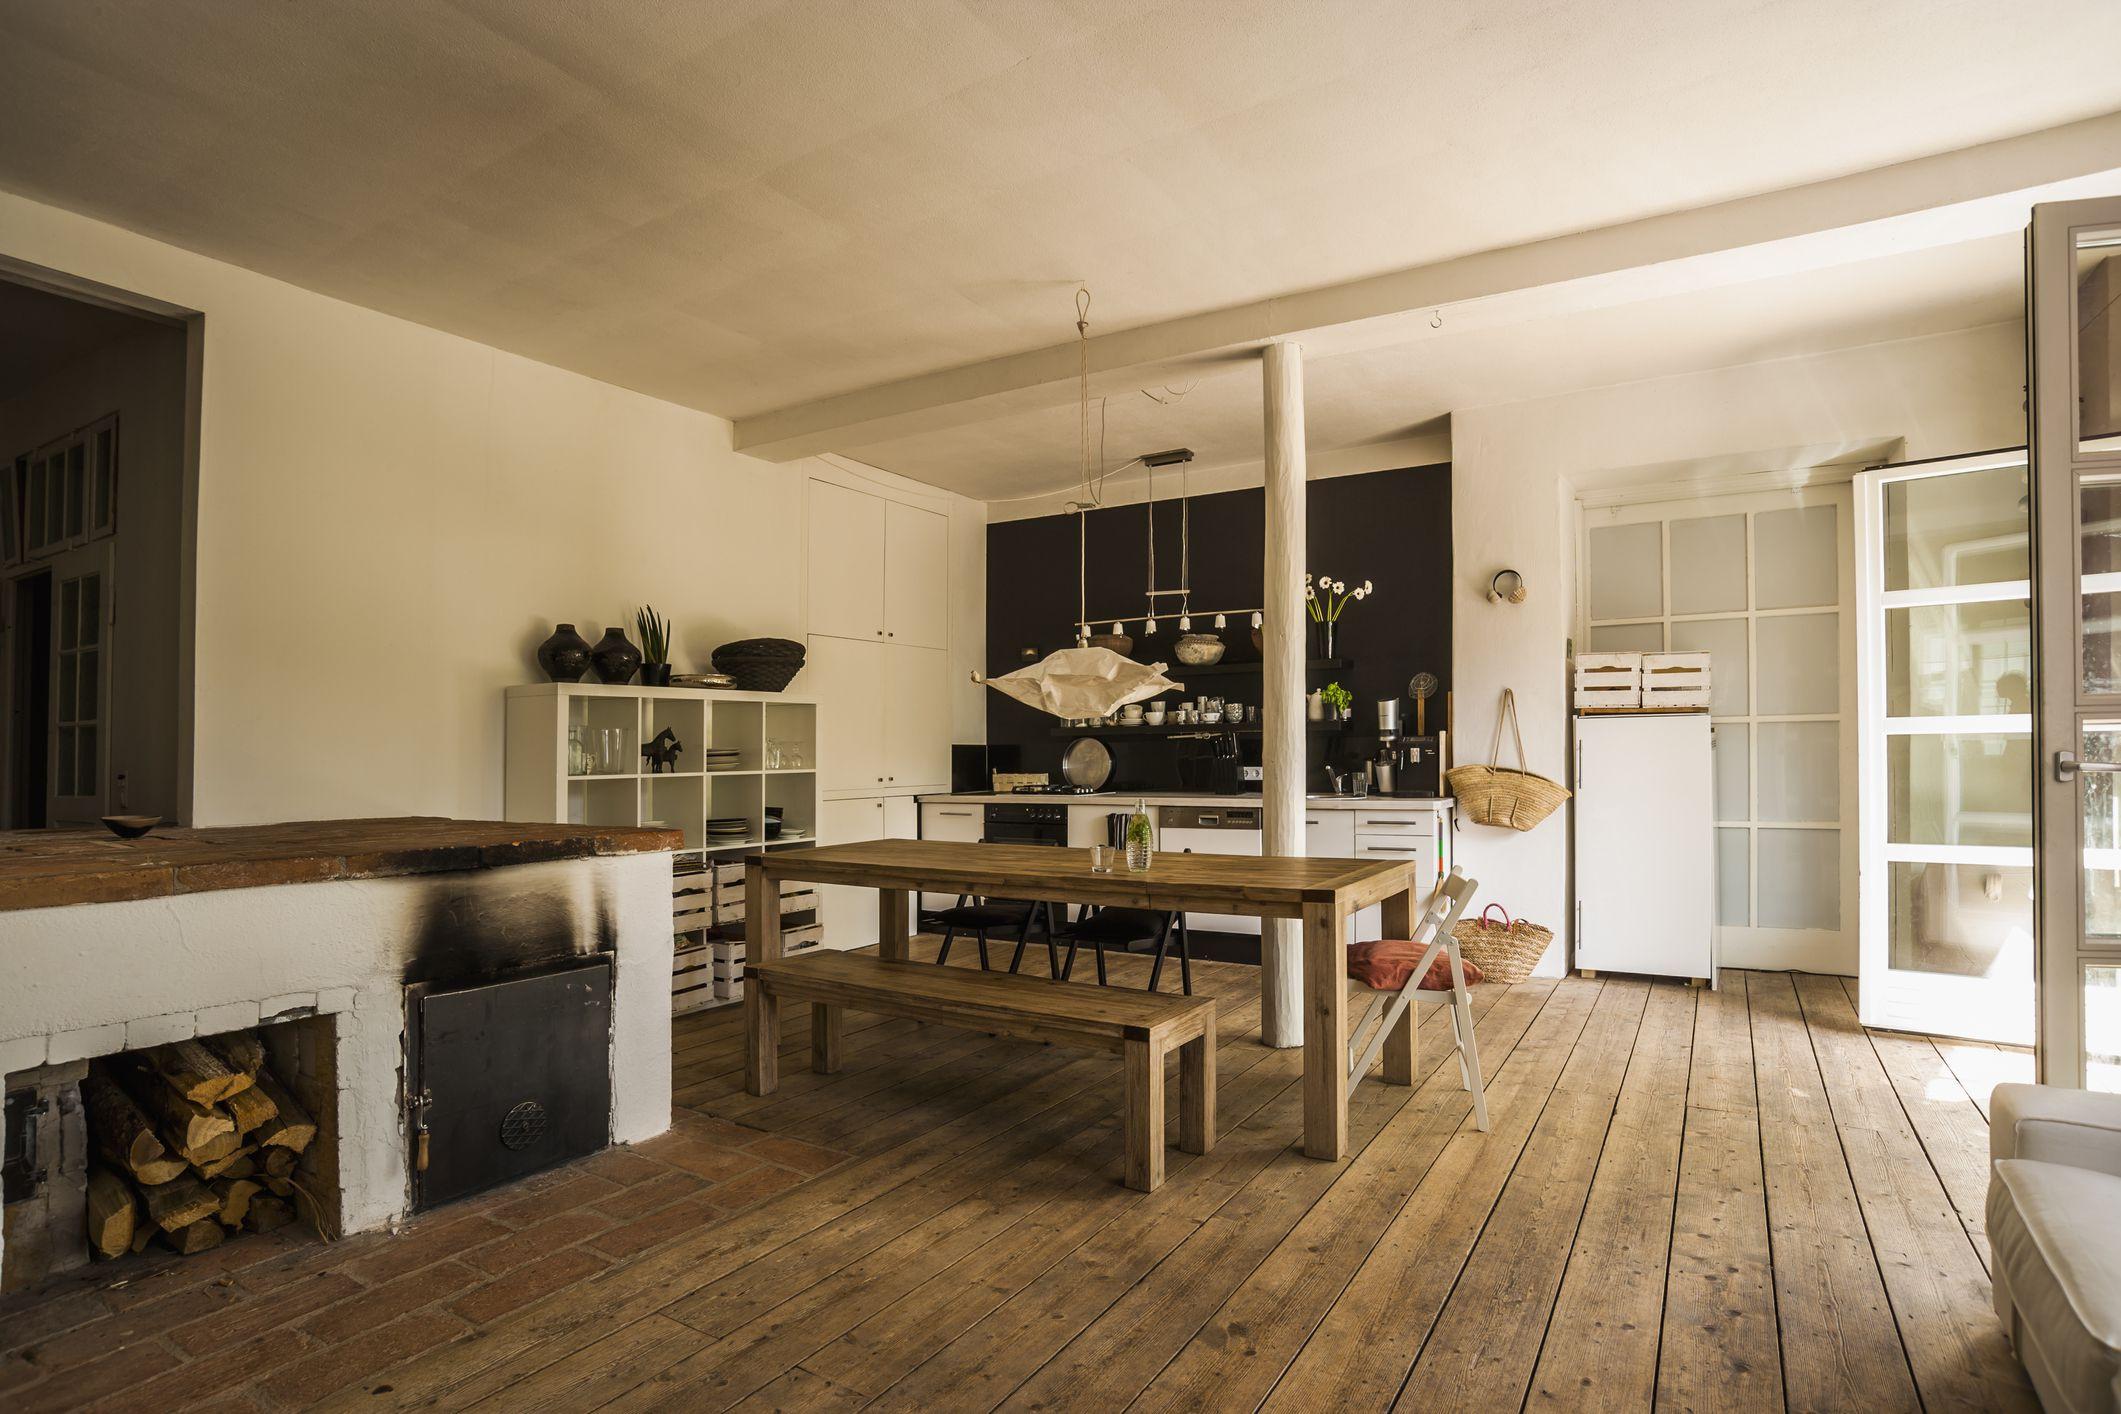 average price to refinish hardwood floors of vinyl wood flooring versus natural hardwood regarding diningroom woodenfloor gettyimages 544546775 590e57565f9b58647043440a